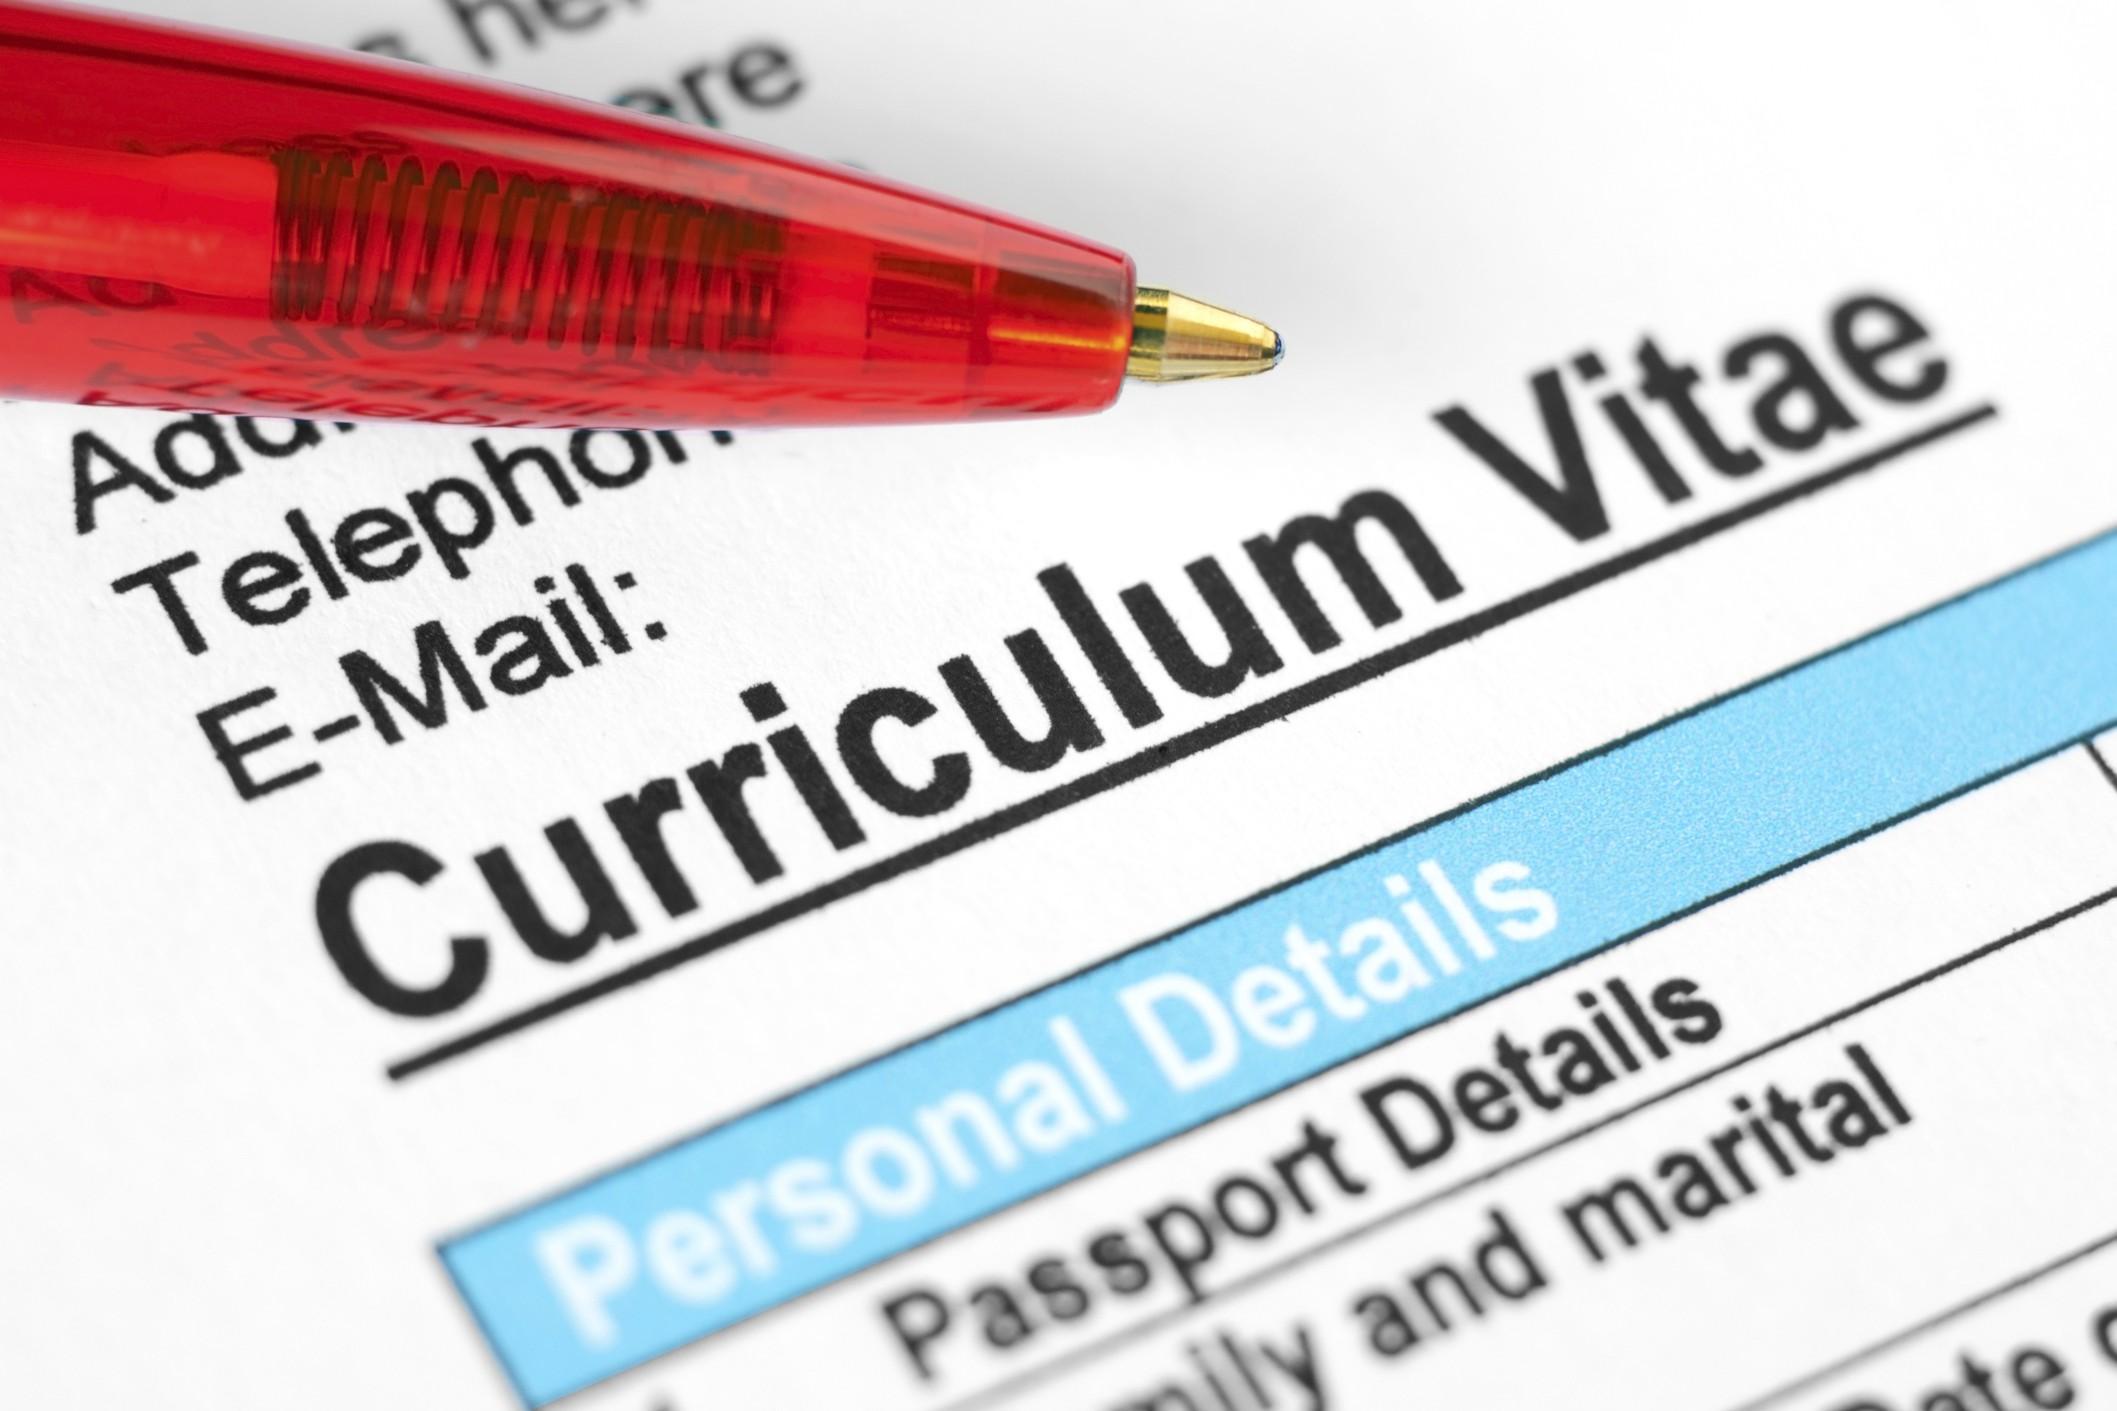 come-redigere-un-curriculum-vitae-europeo_c749d6590d9dad9172a2dd61e5bcd121